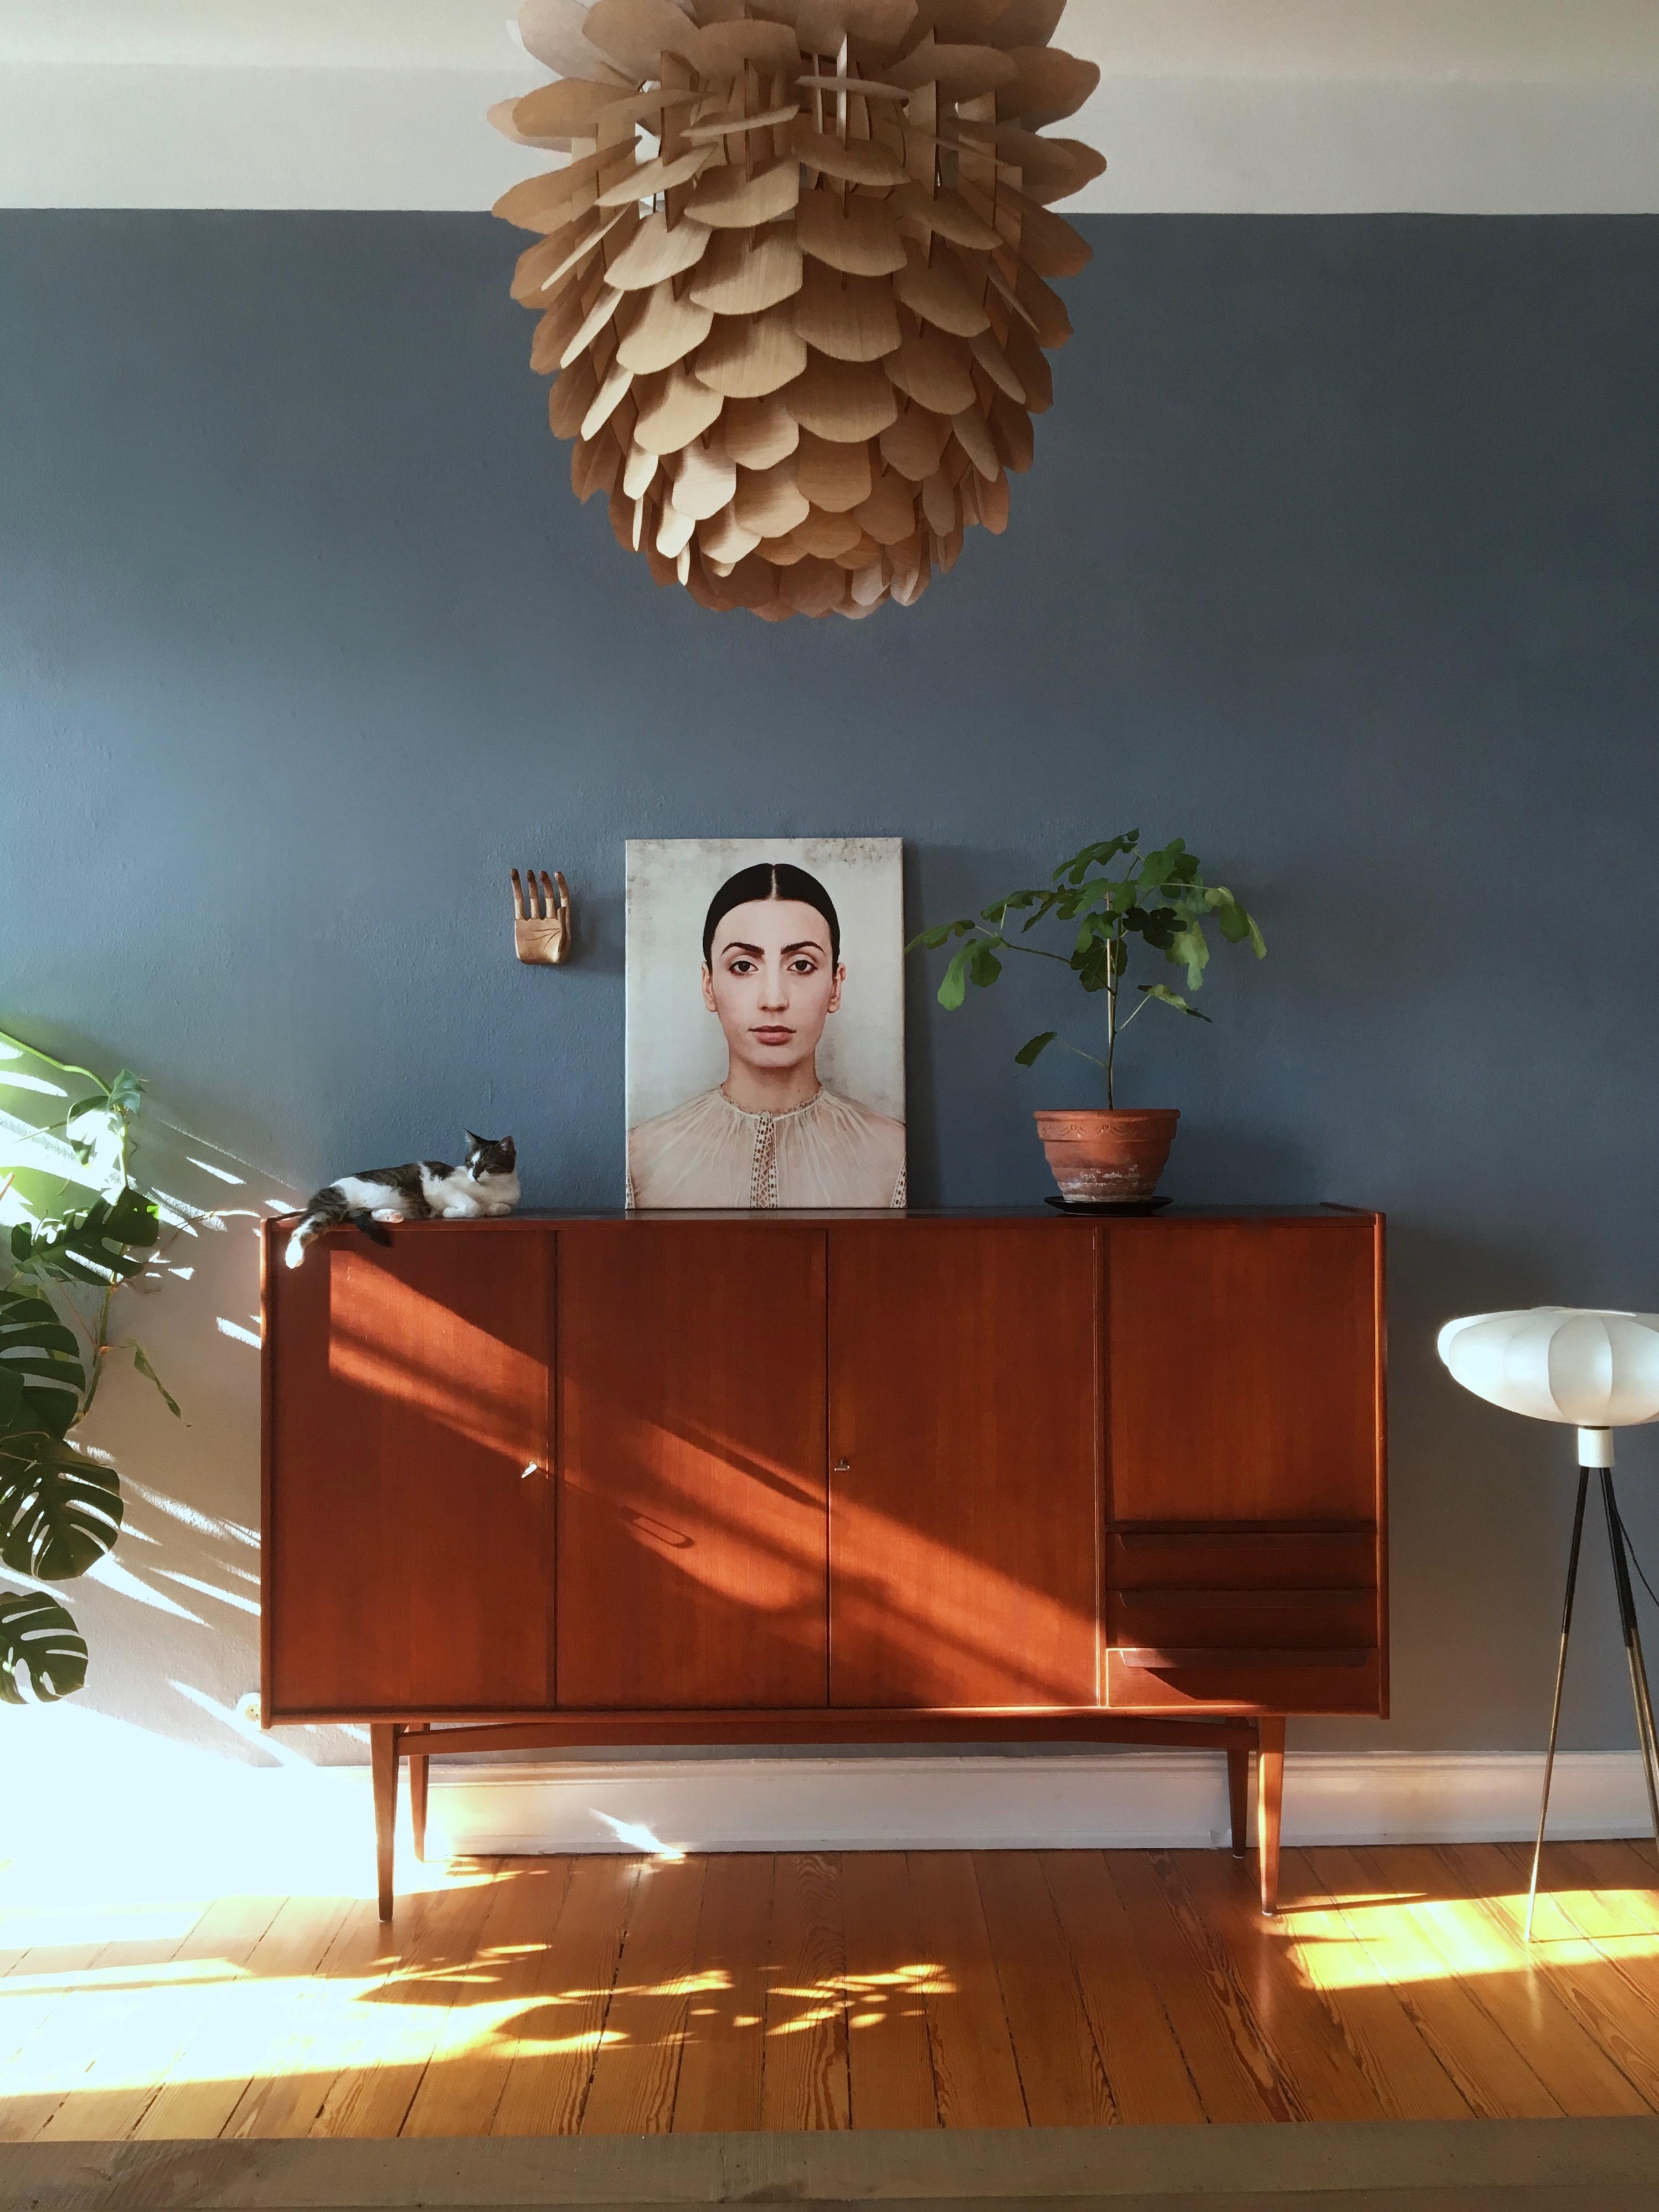 Teak Love Altbau Holzdielen Midcentury Vintage Dielenboden Altbauwohnung  Esszimmer 12549e82 6a1d 4452 9d85 0e0b0ece151b